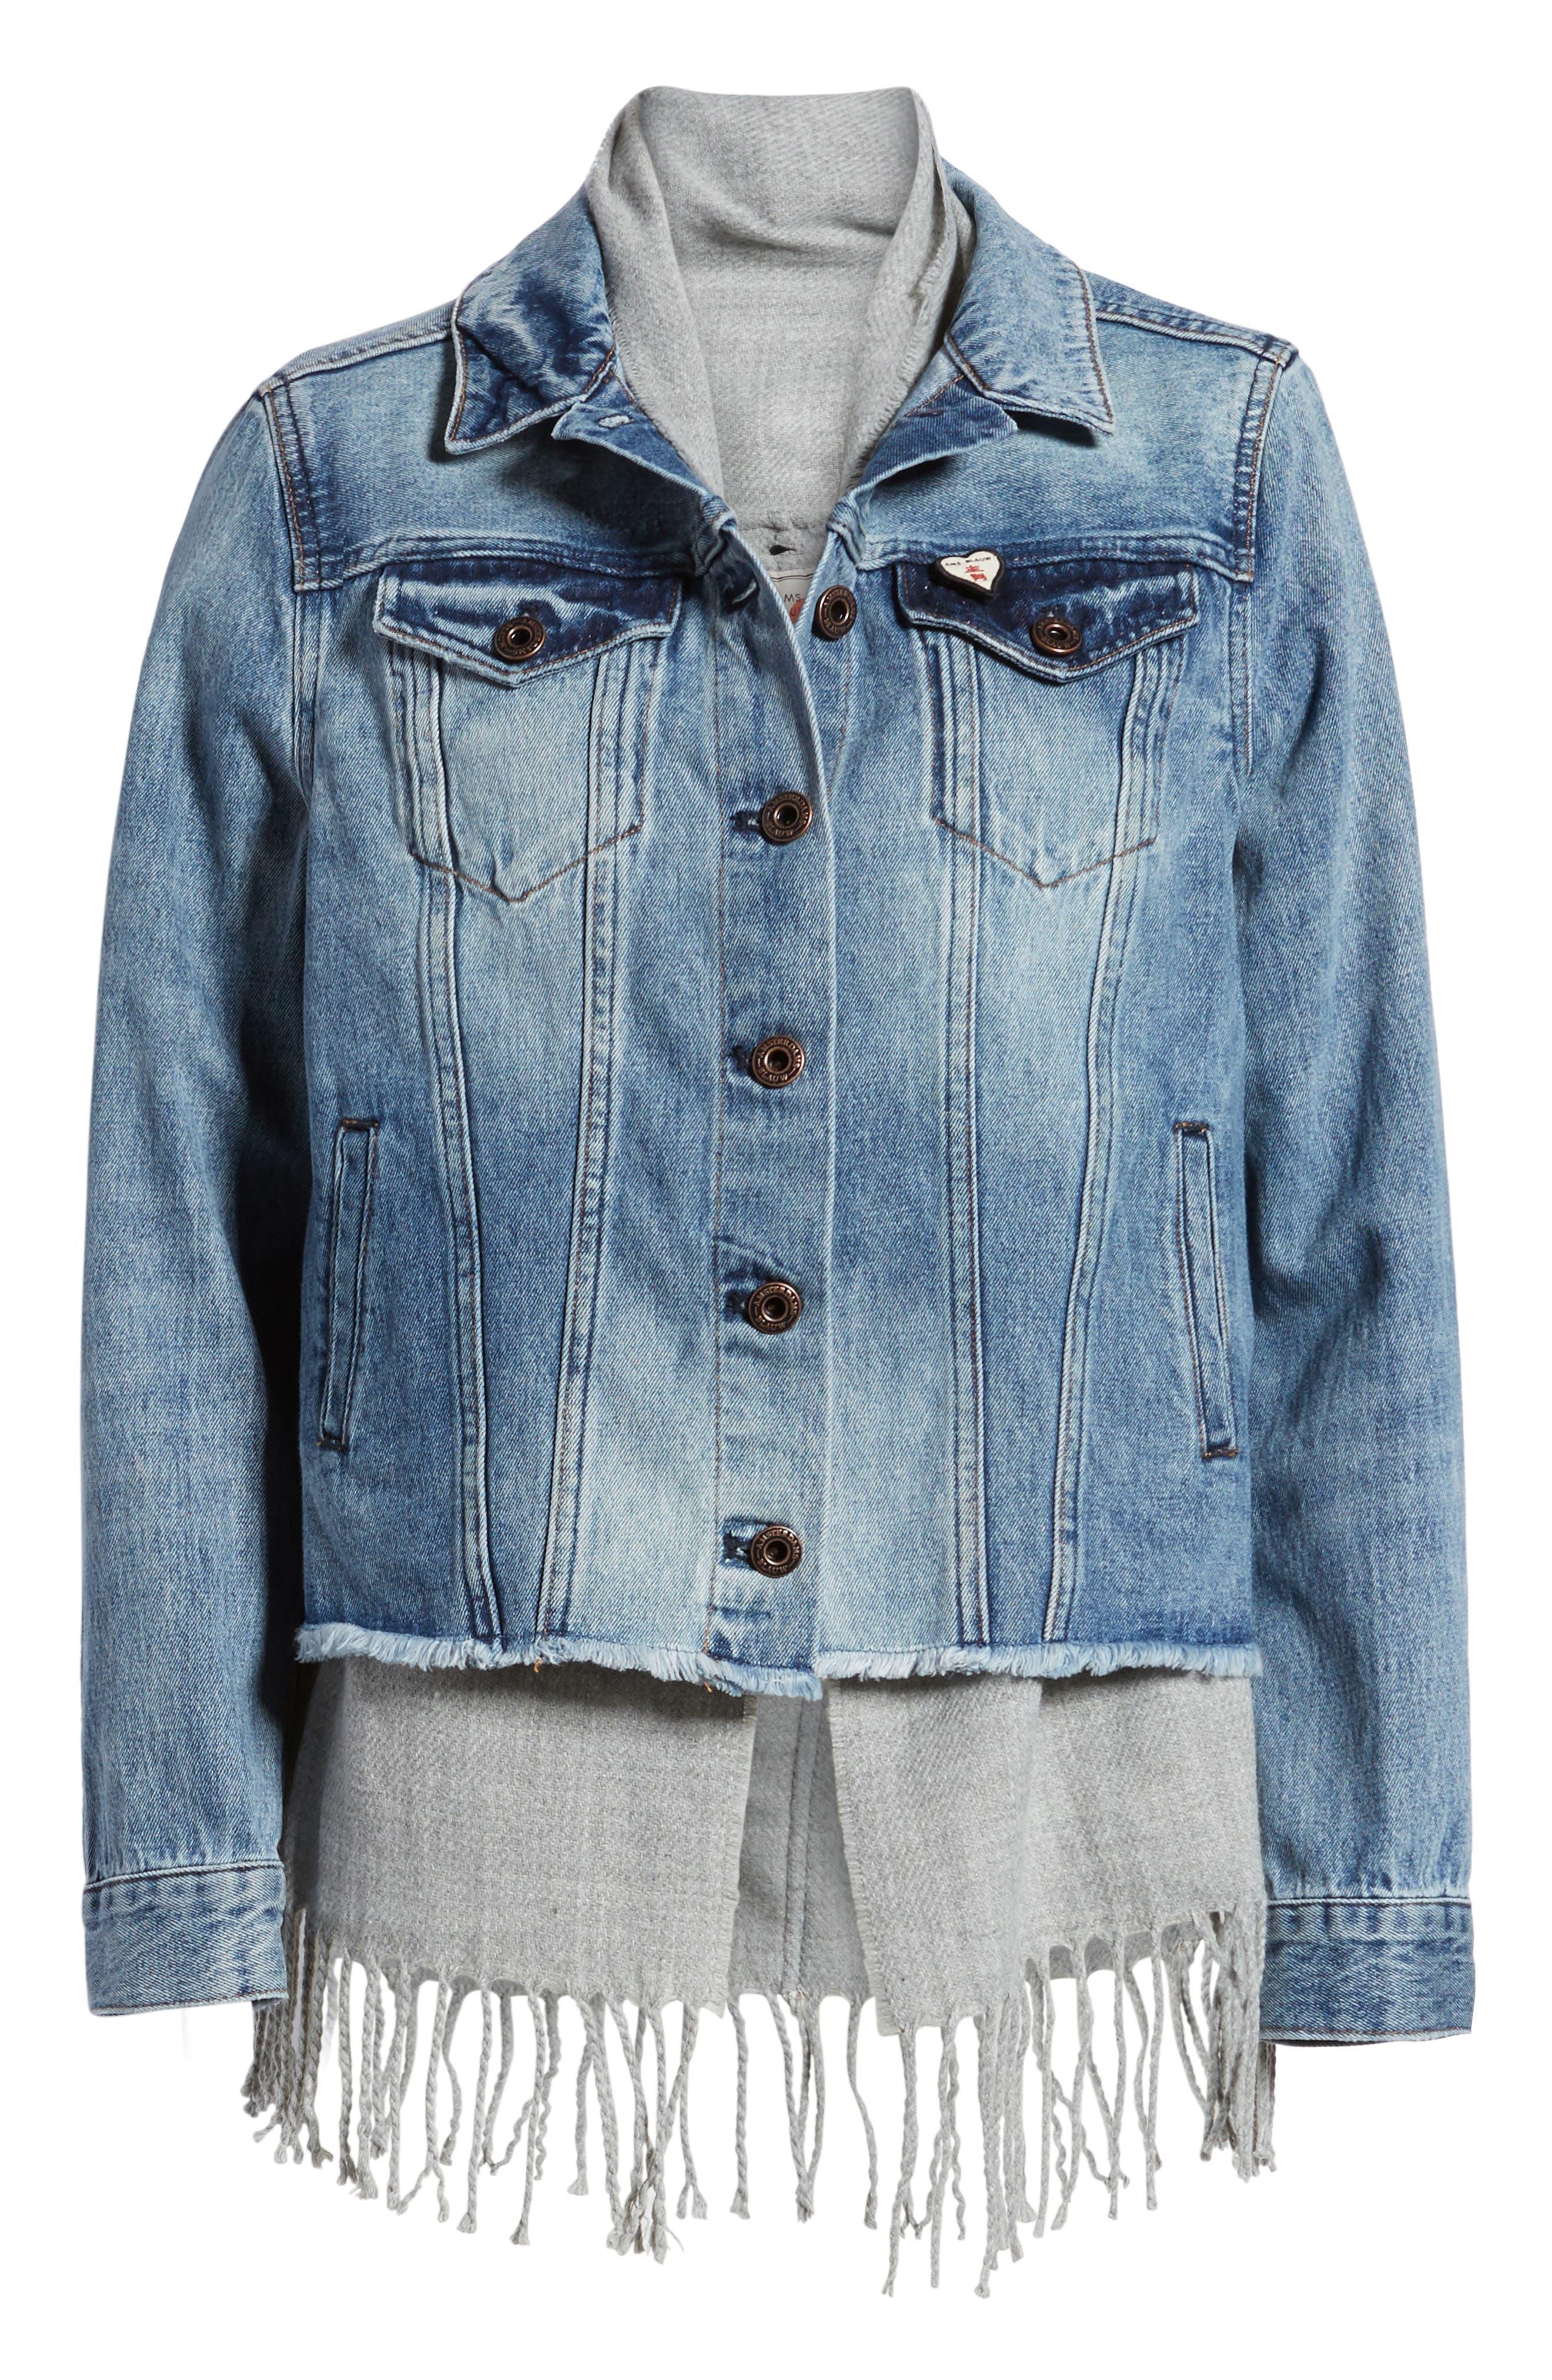 Denim Trucker Jacket with Removable Vest,                             Alternate thumbnail 5, color,                             420